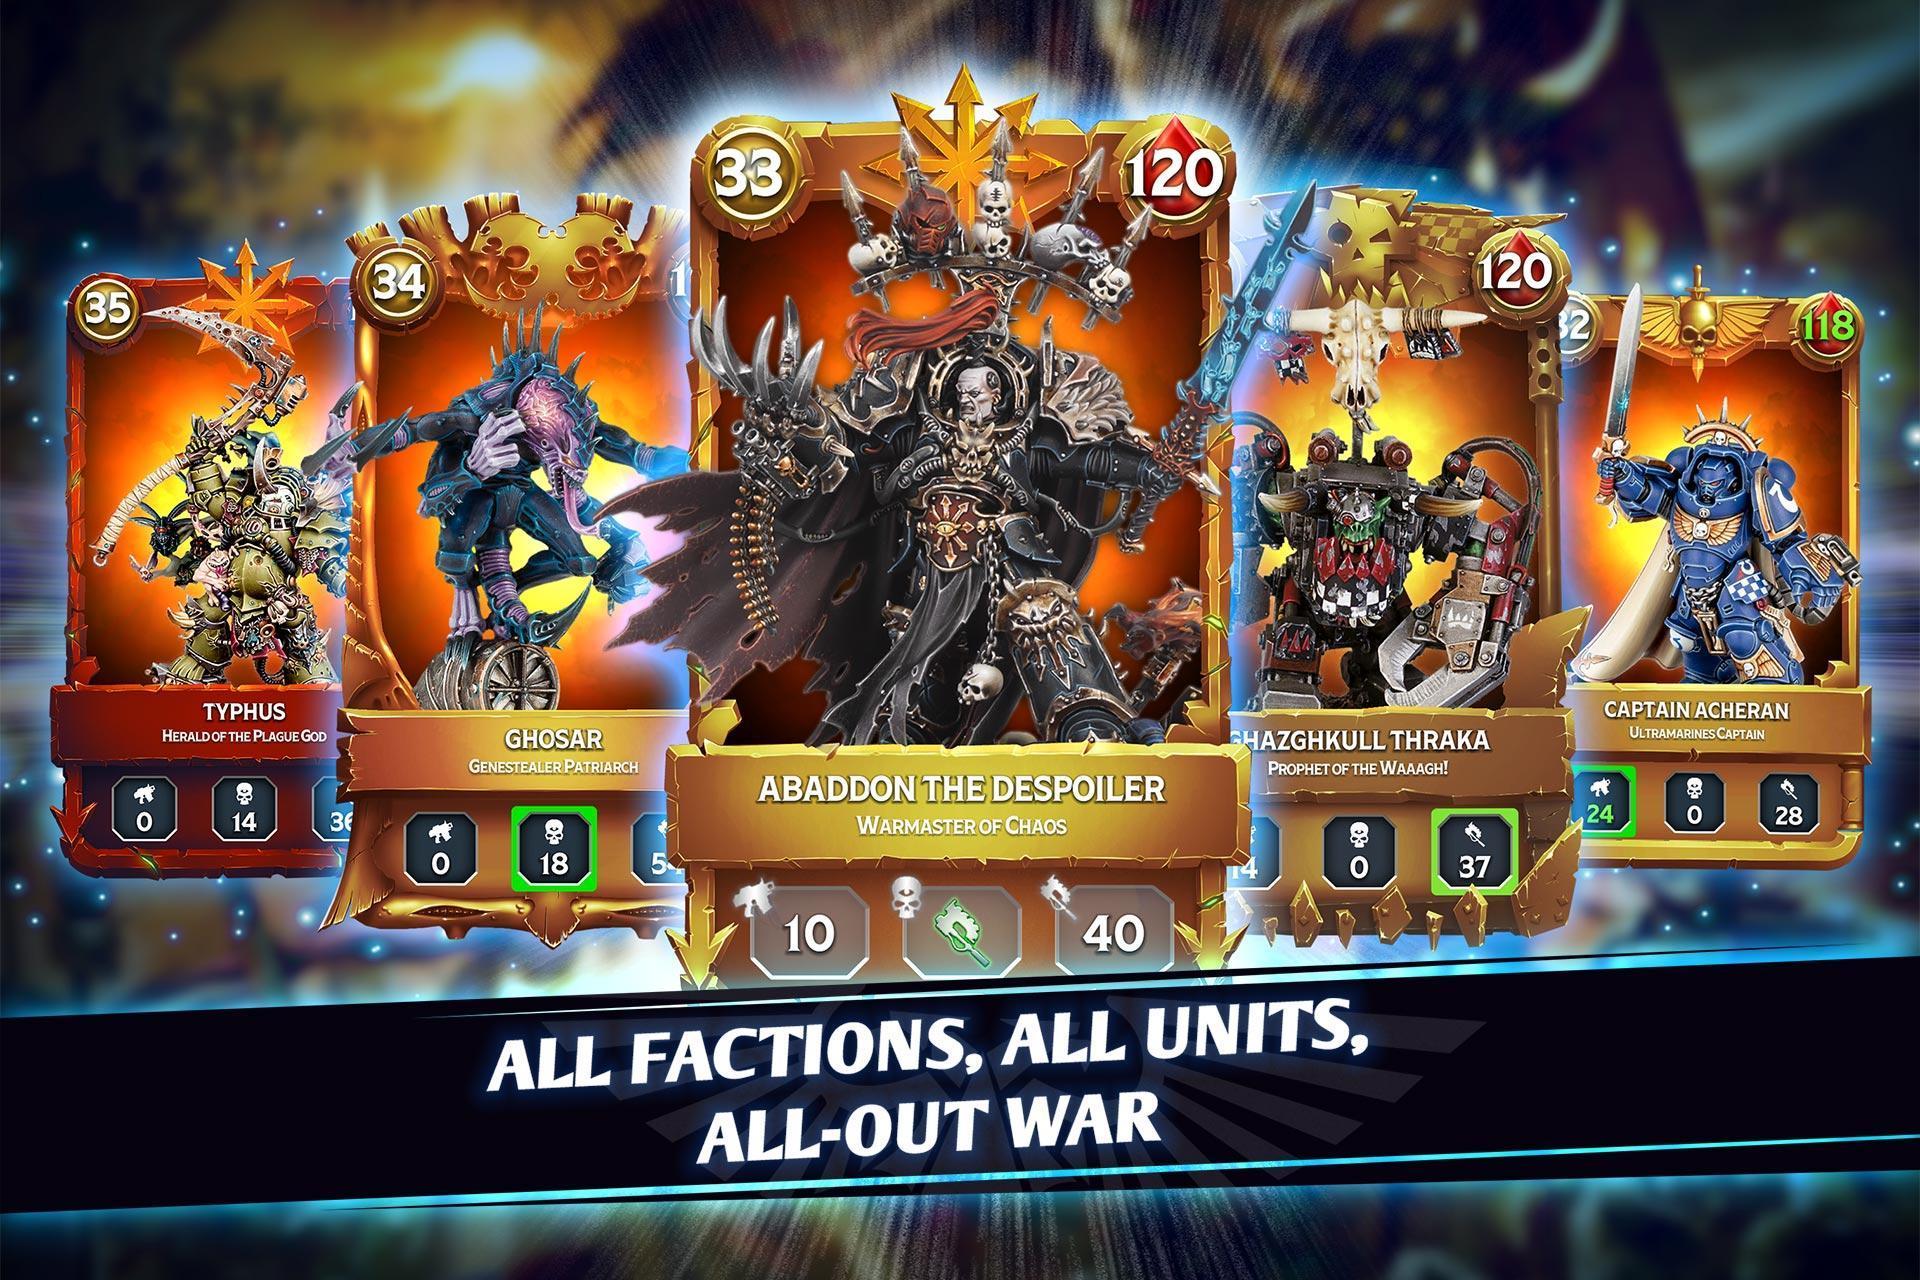 Warhammer Combat Cards - 40K Edition 30.10 Screenshot 1